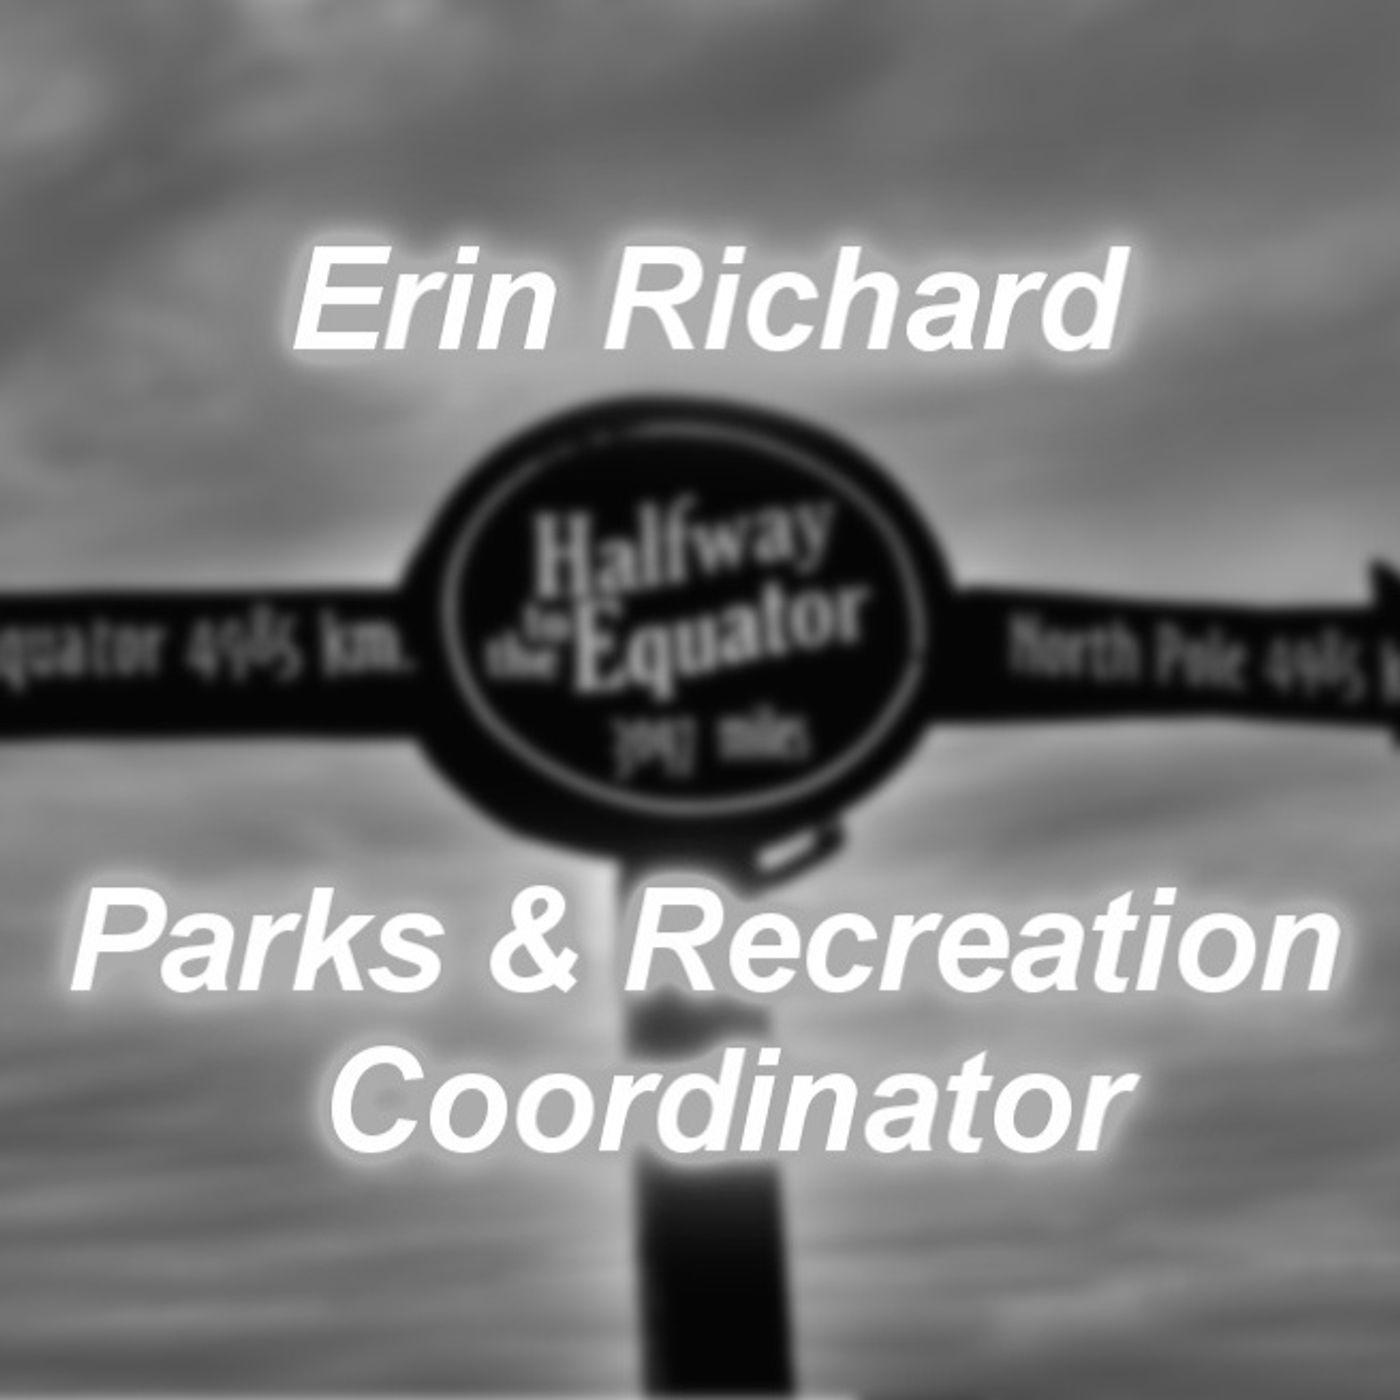 Erin Richard